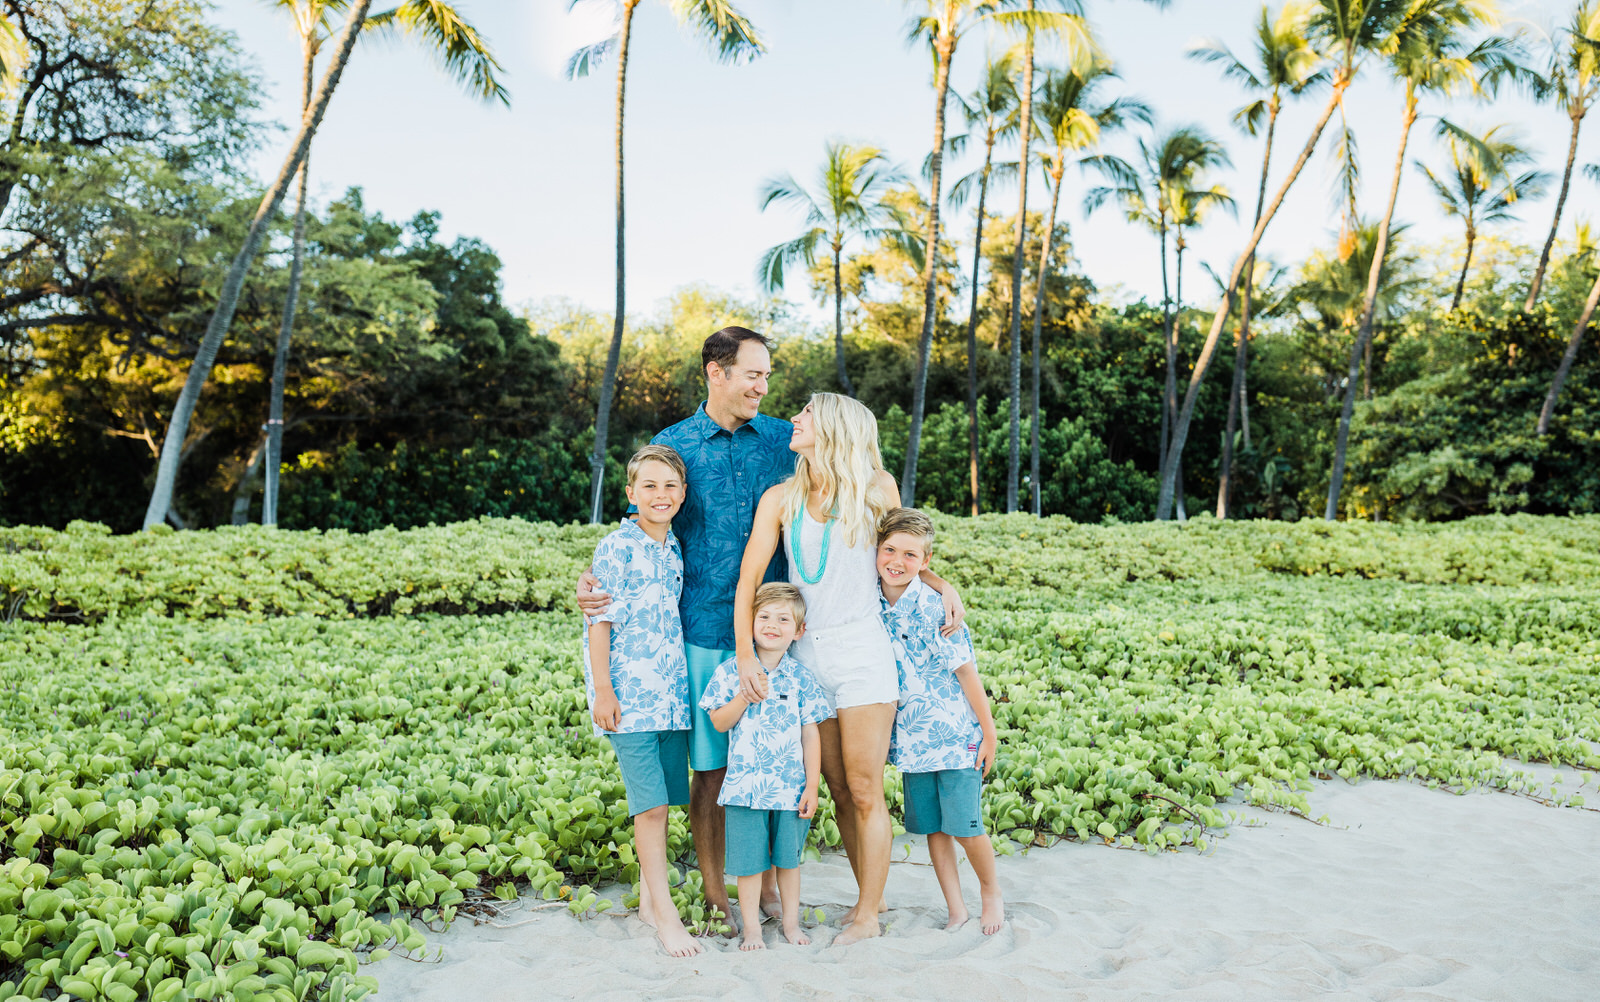 big-island-photographer-family-session-mauna-kea-resort-summer-waikoloa-sunrise-3567.jpg